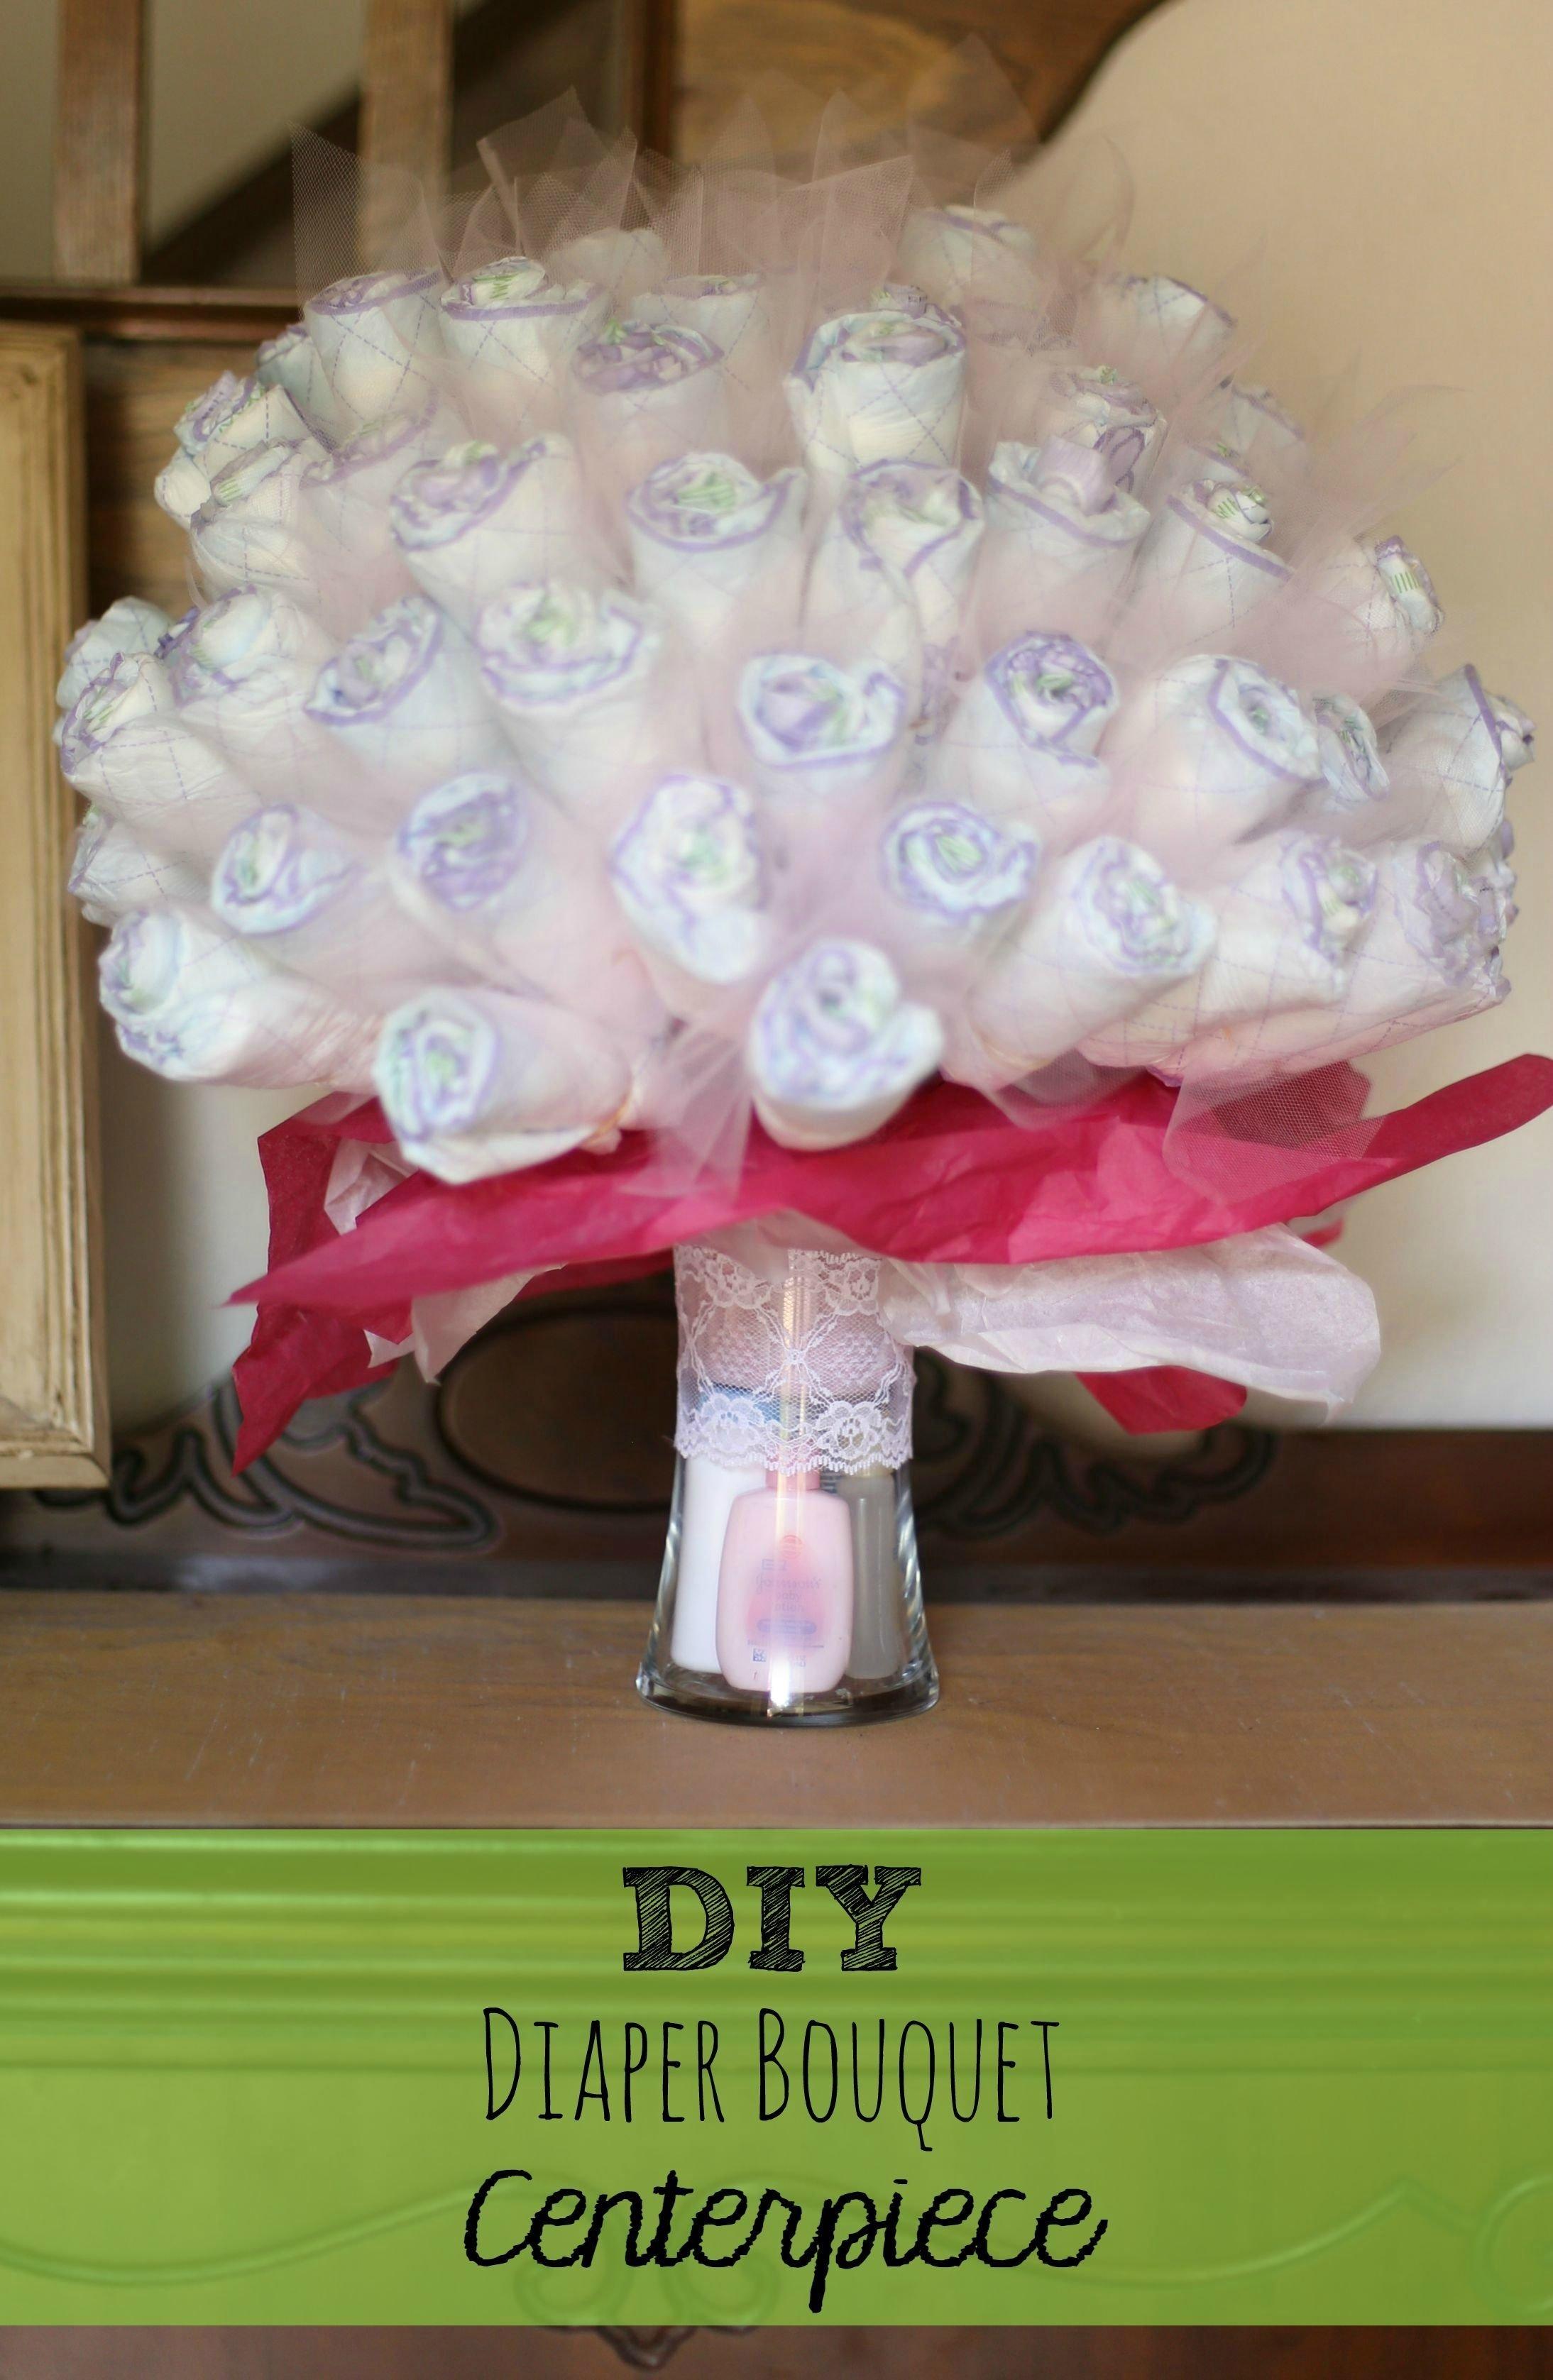 10 Pretty Diaper Ideas For Baby Shower diy diaper bouquet centerpiece perfect baby shower gift idea 2020